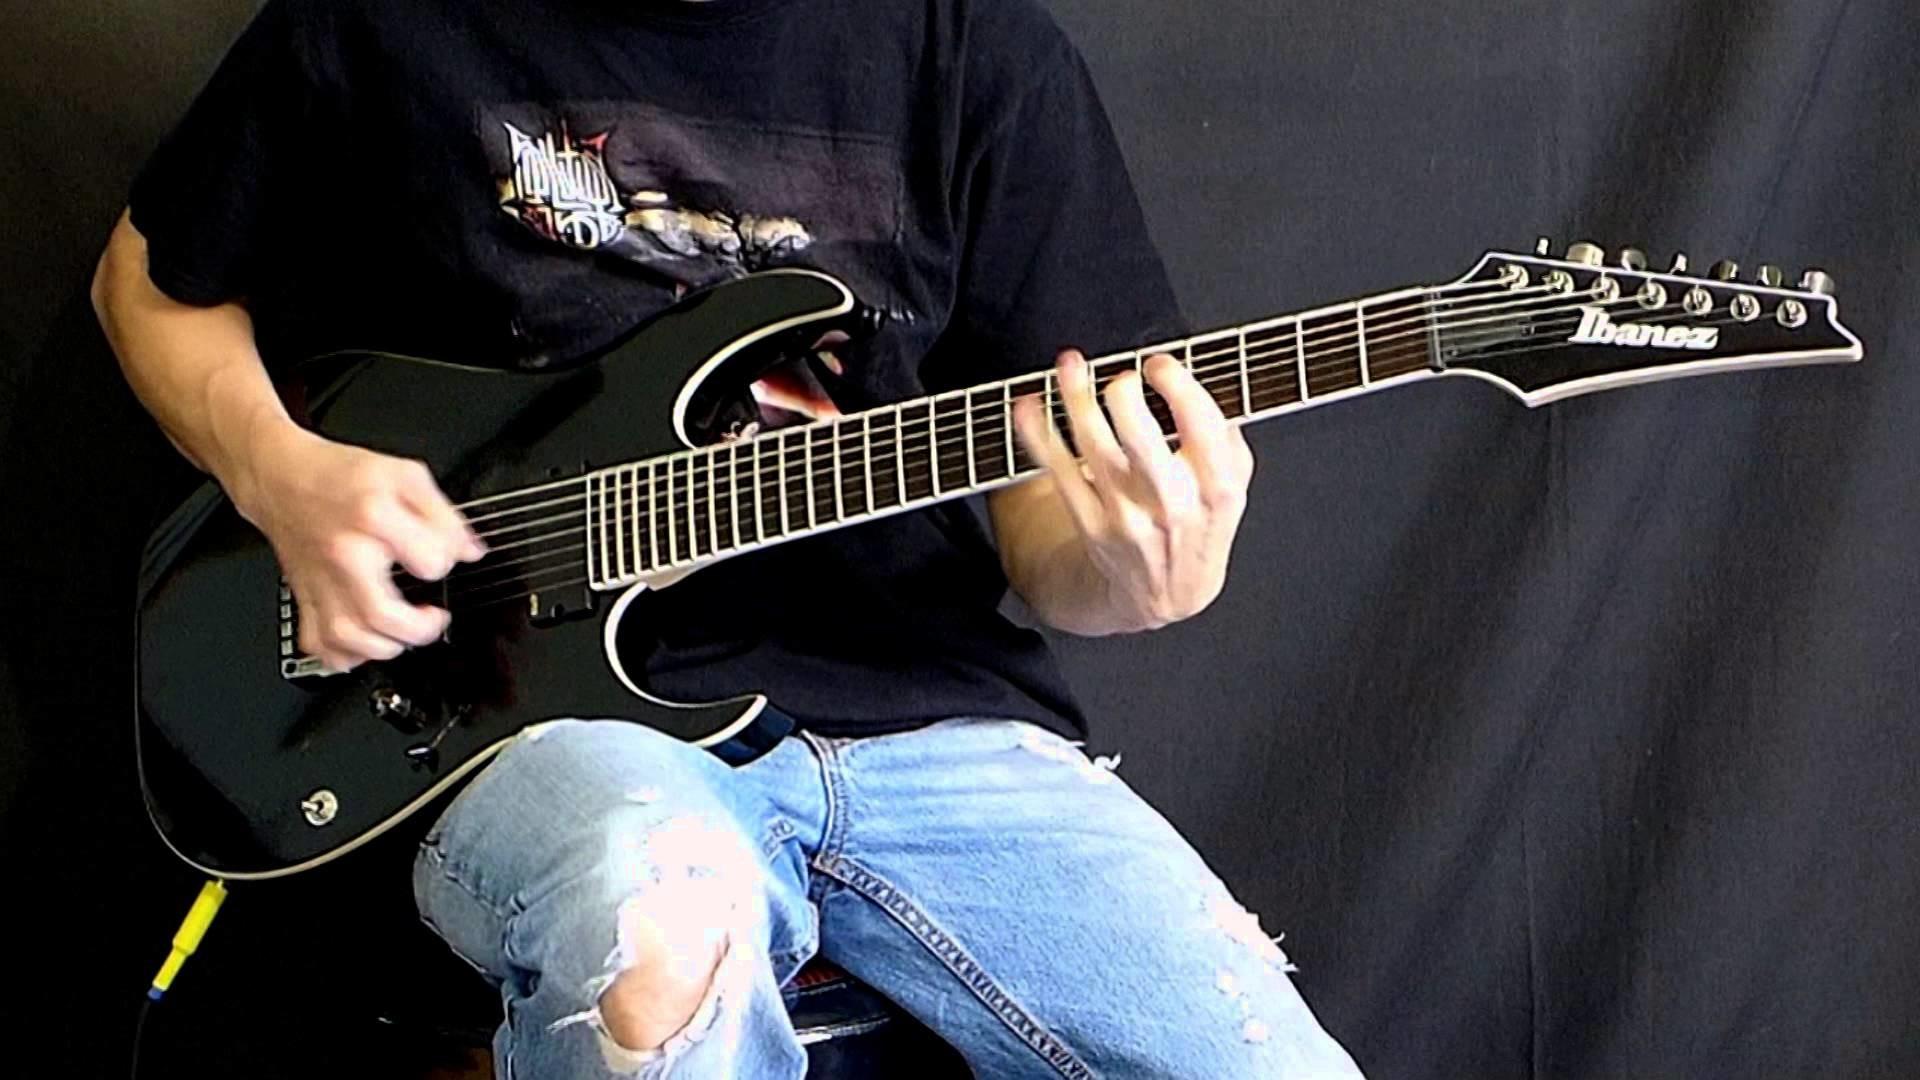 ibanez guitar wallpaper 55 images